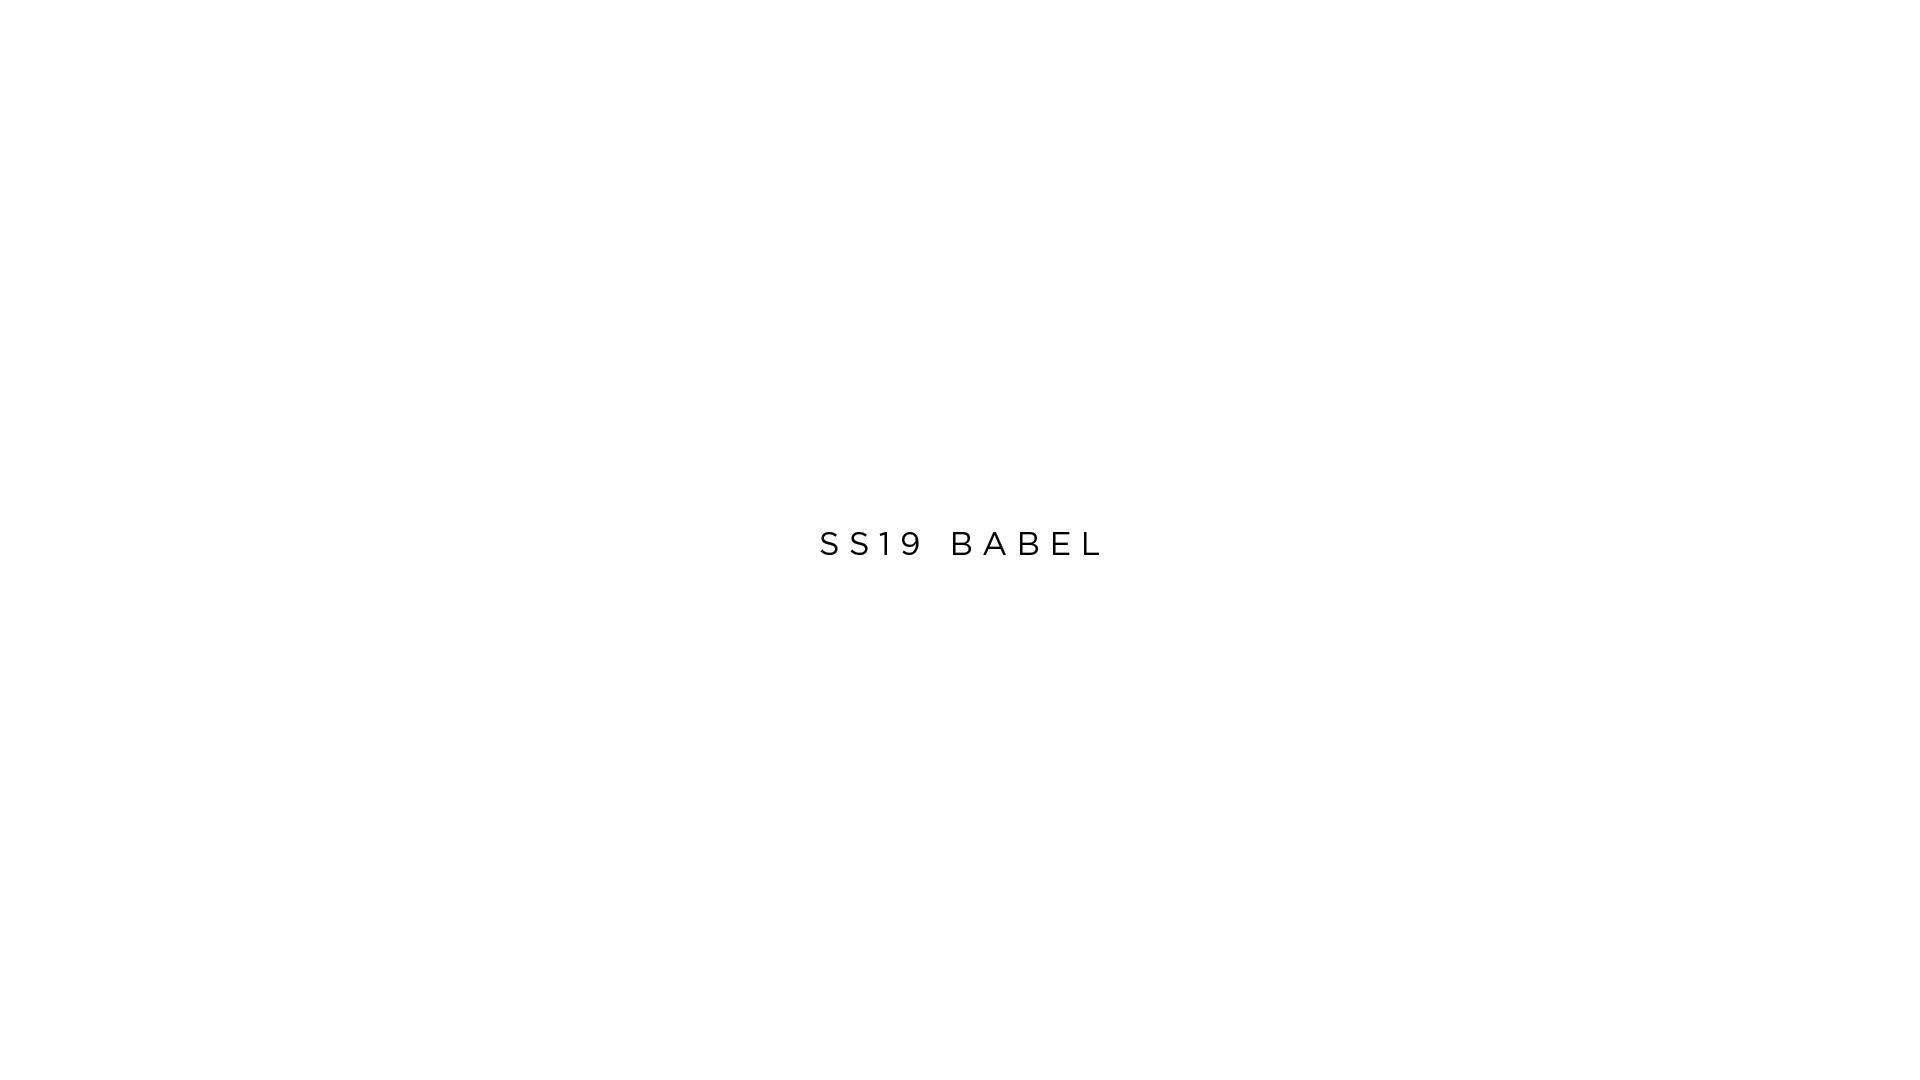 ss19 babel